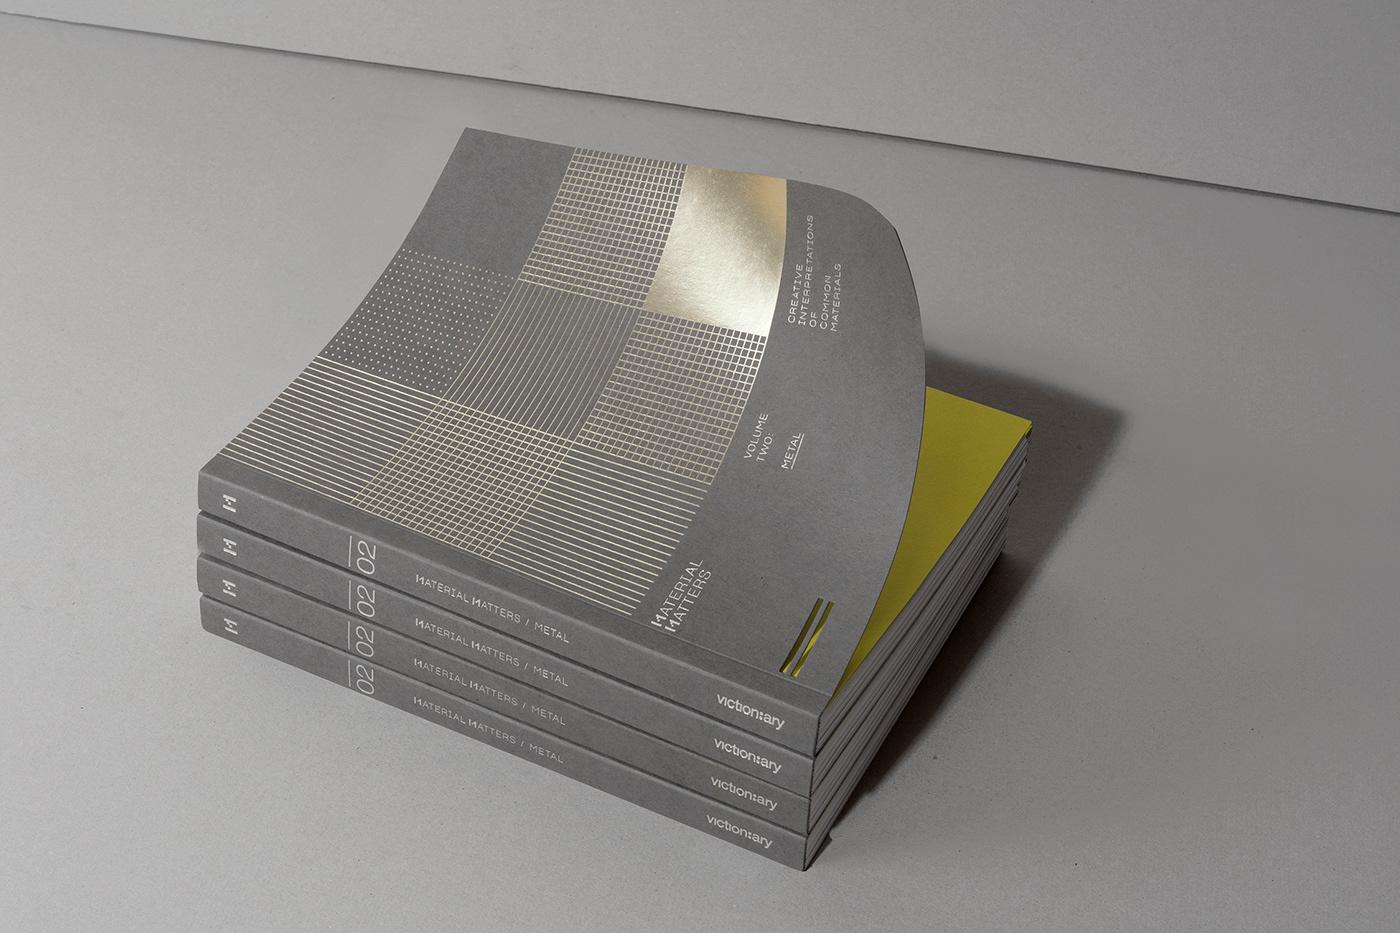 book material materials metal design gold silver metallic copper oxidizing